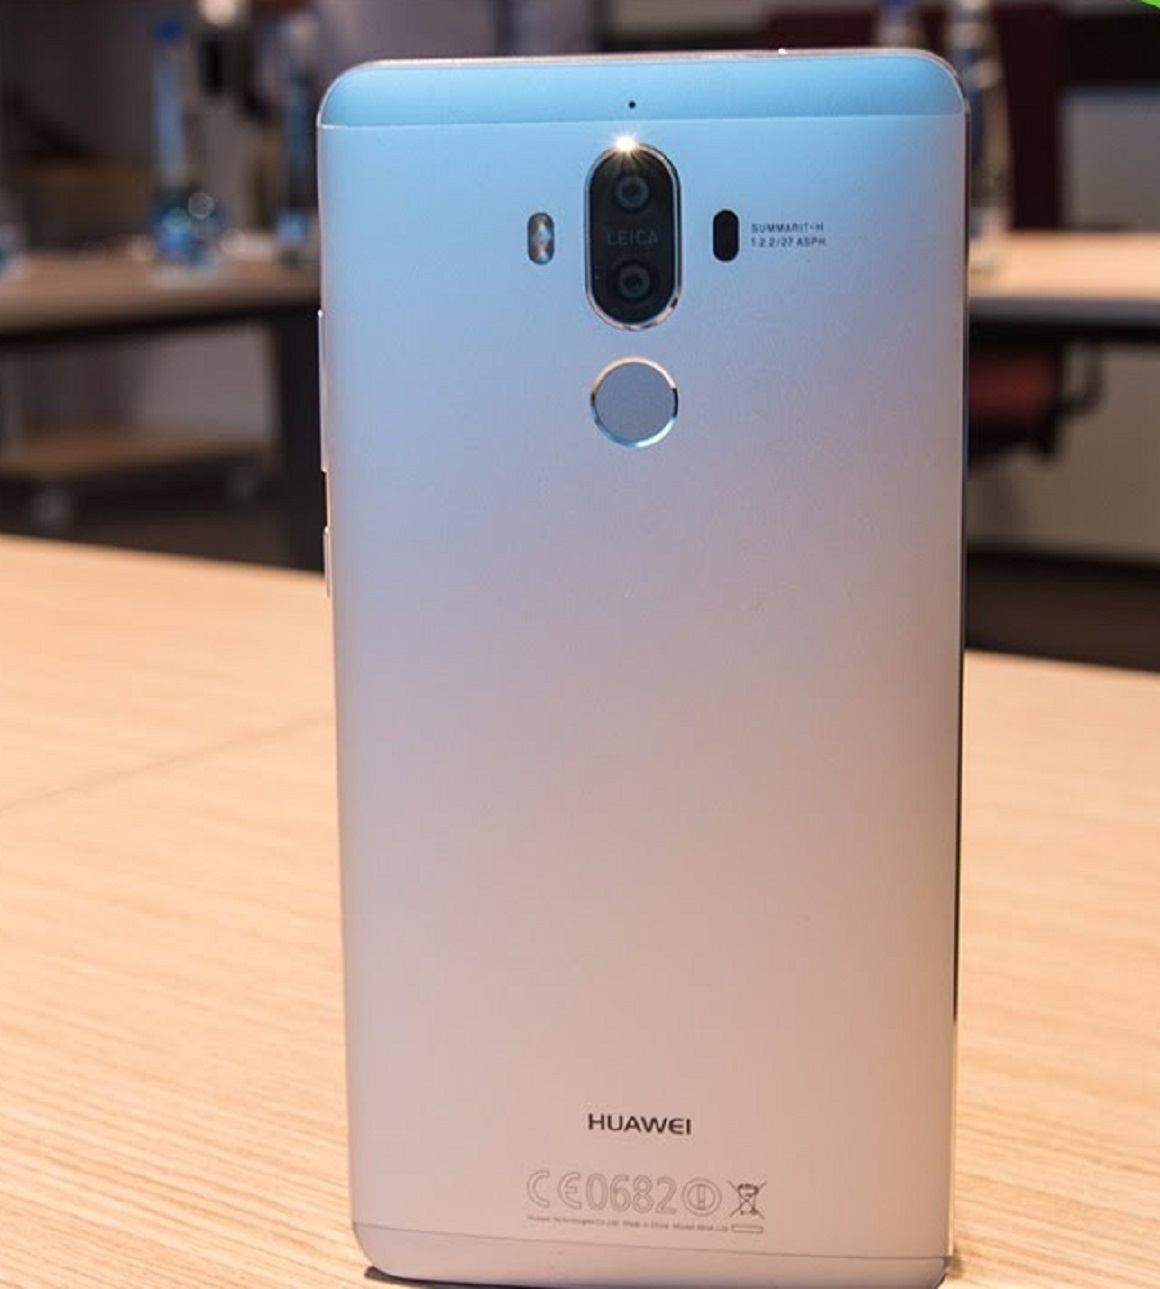 Huawei Mate 9 International Giveaway!